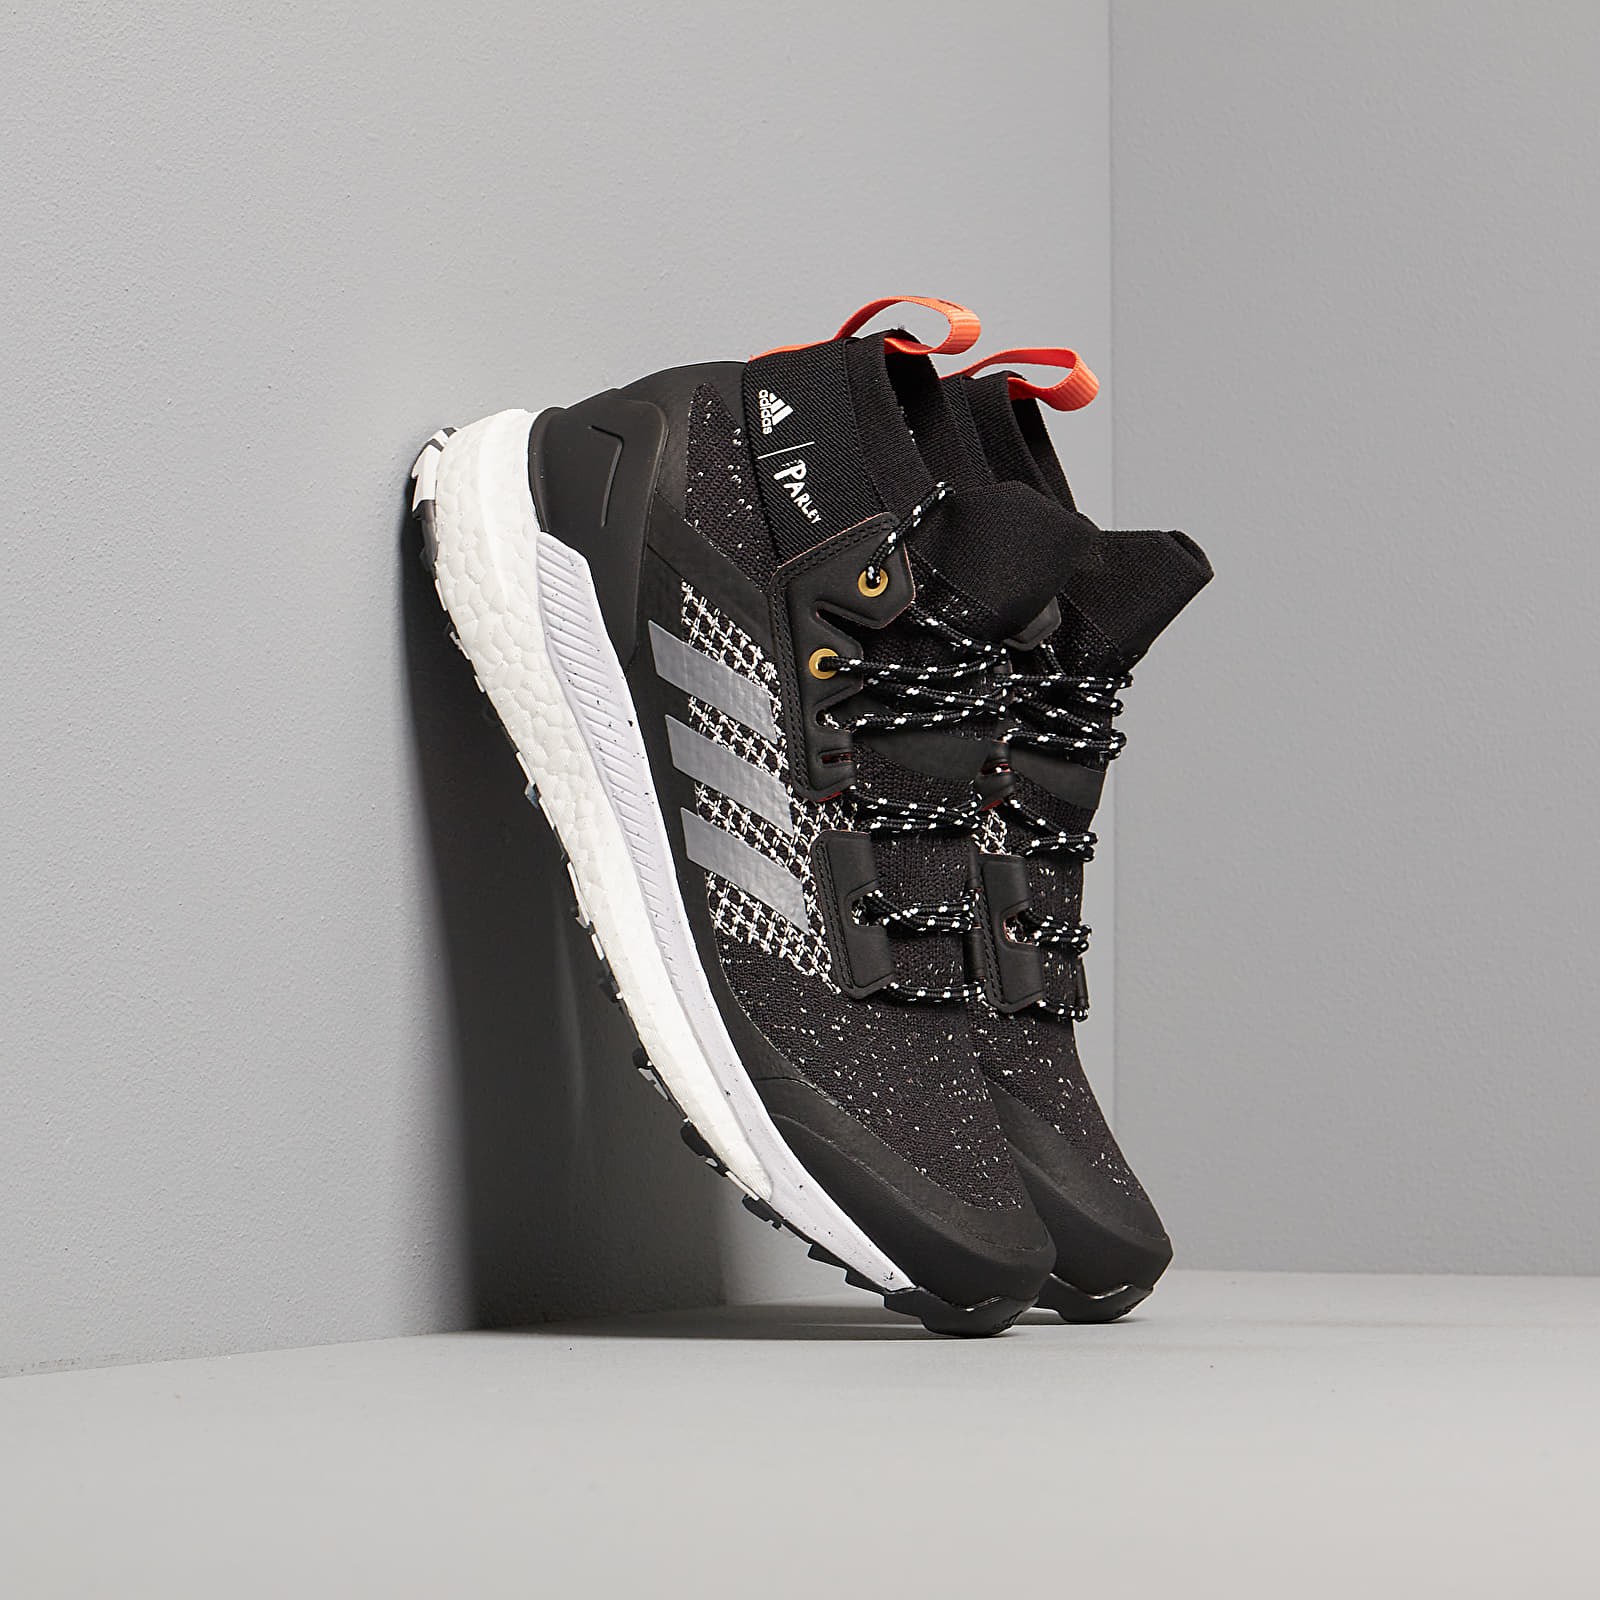 Pánske tenisky a topánky adidas x Parley Terrex Free Hiker Core Black/ Grey Three/ Blue Spirit